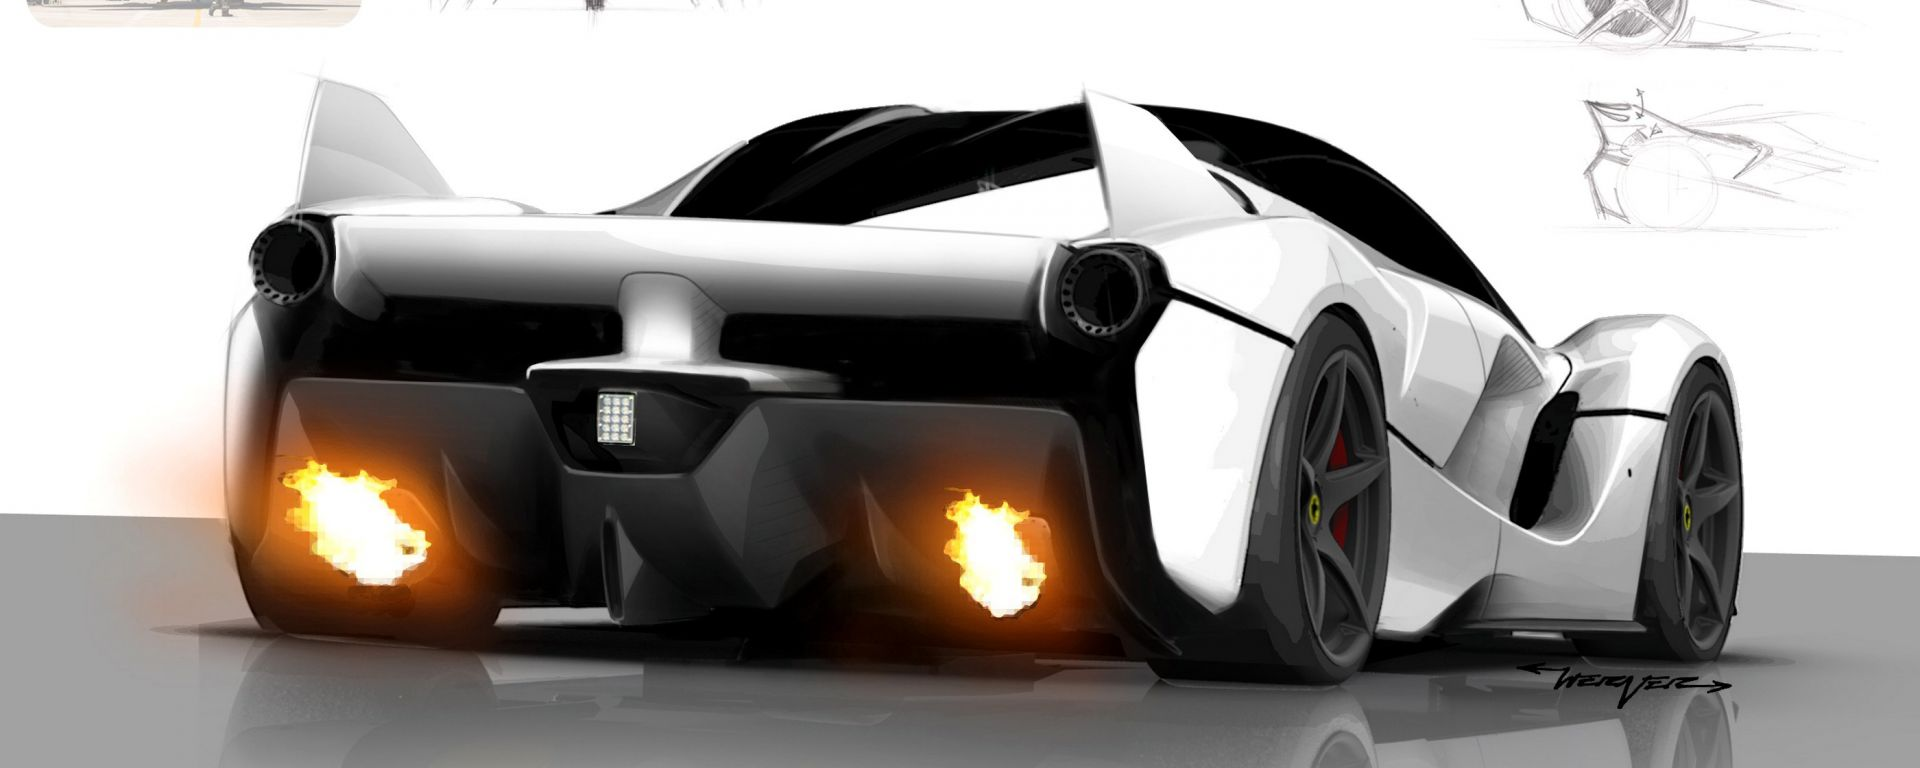 Ferrari FXX K, la genesi del design